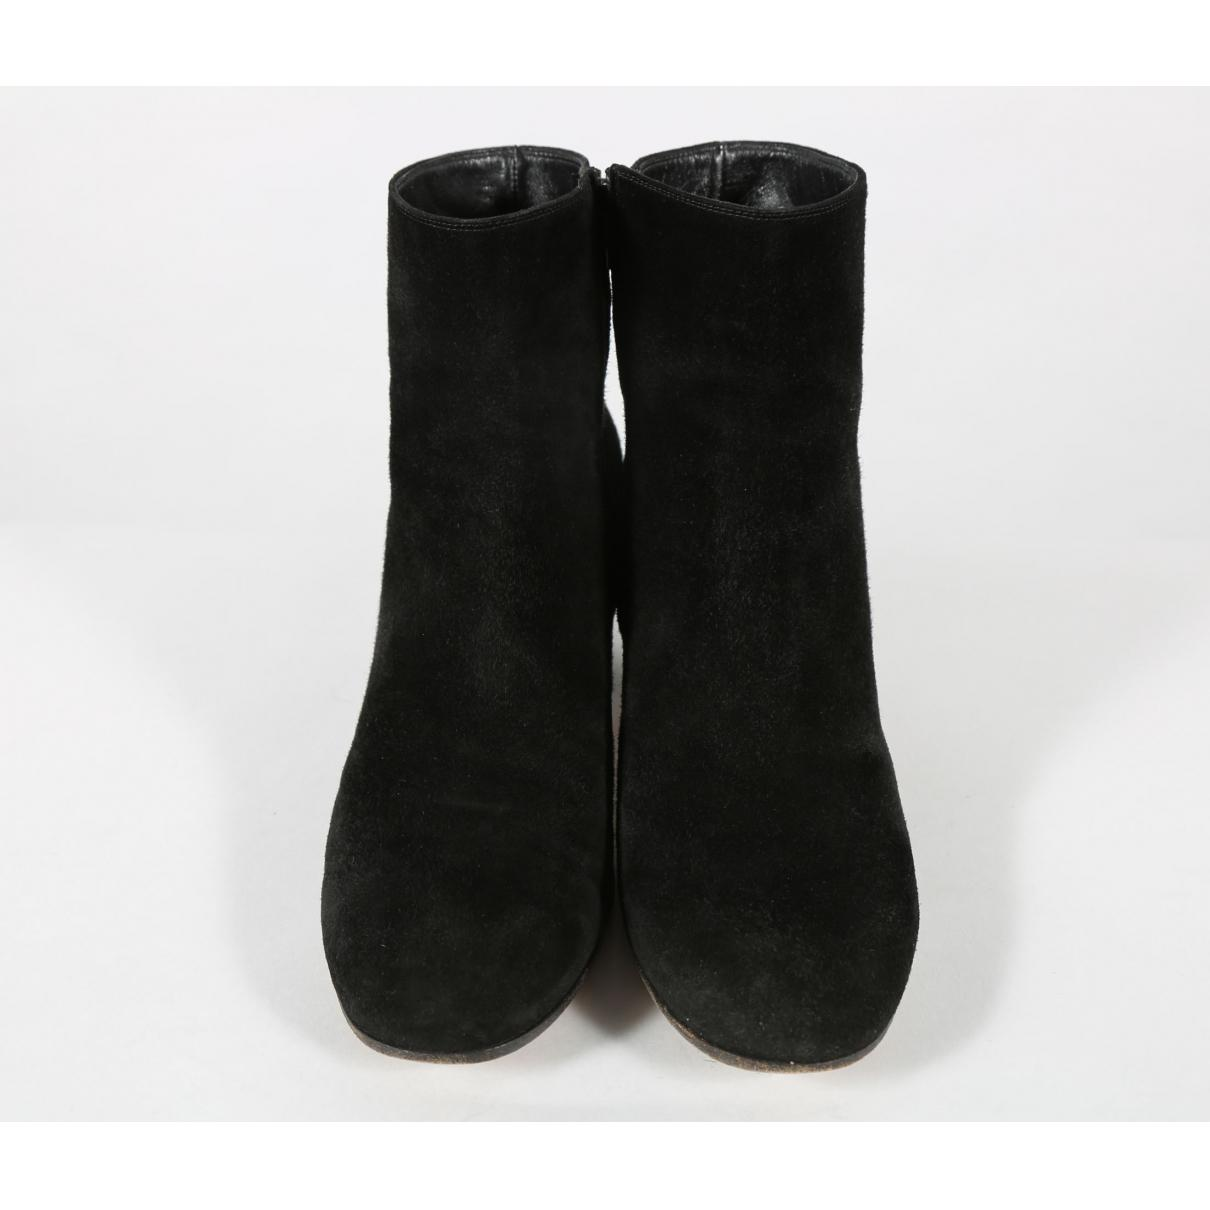 Gianvito Rossi Suede Heel Boots in Black